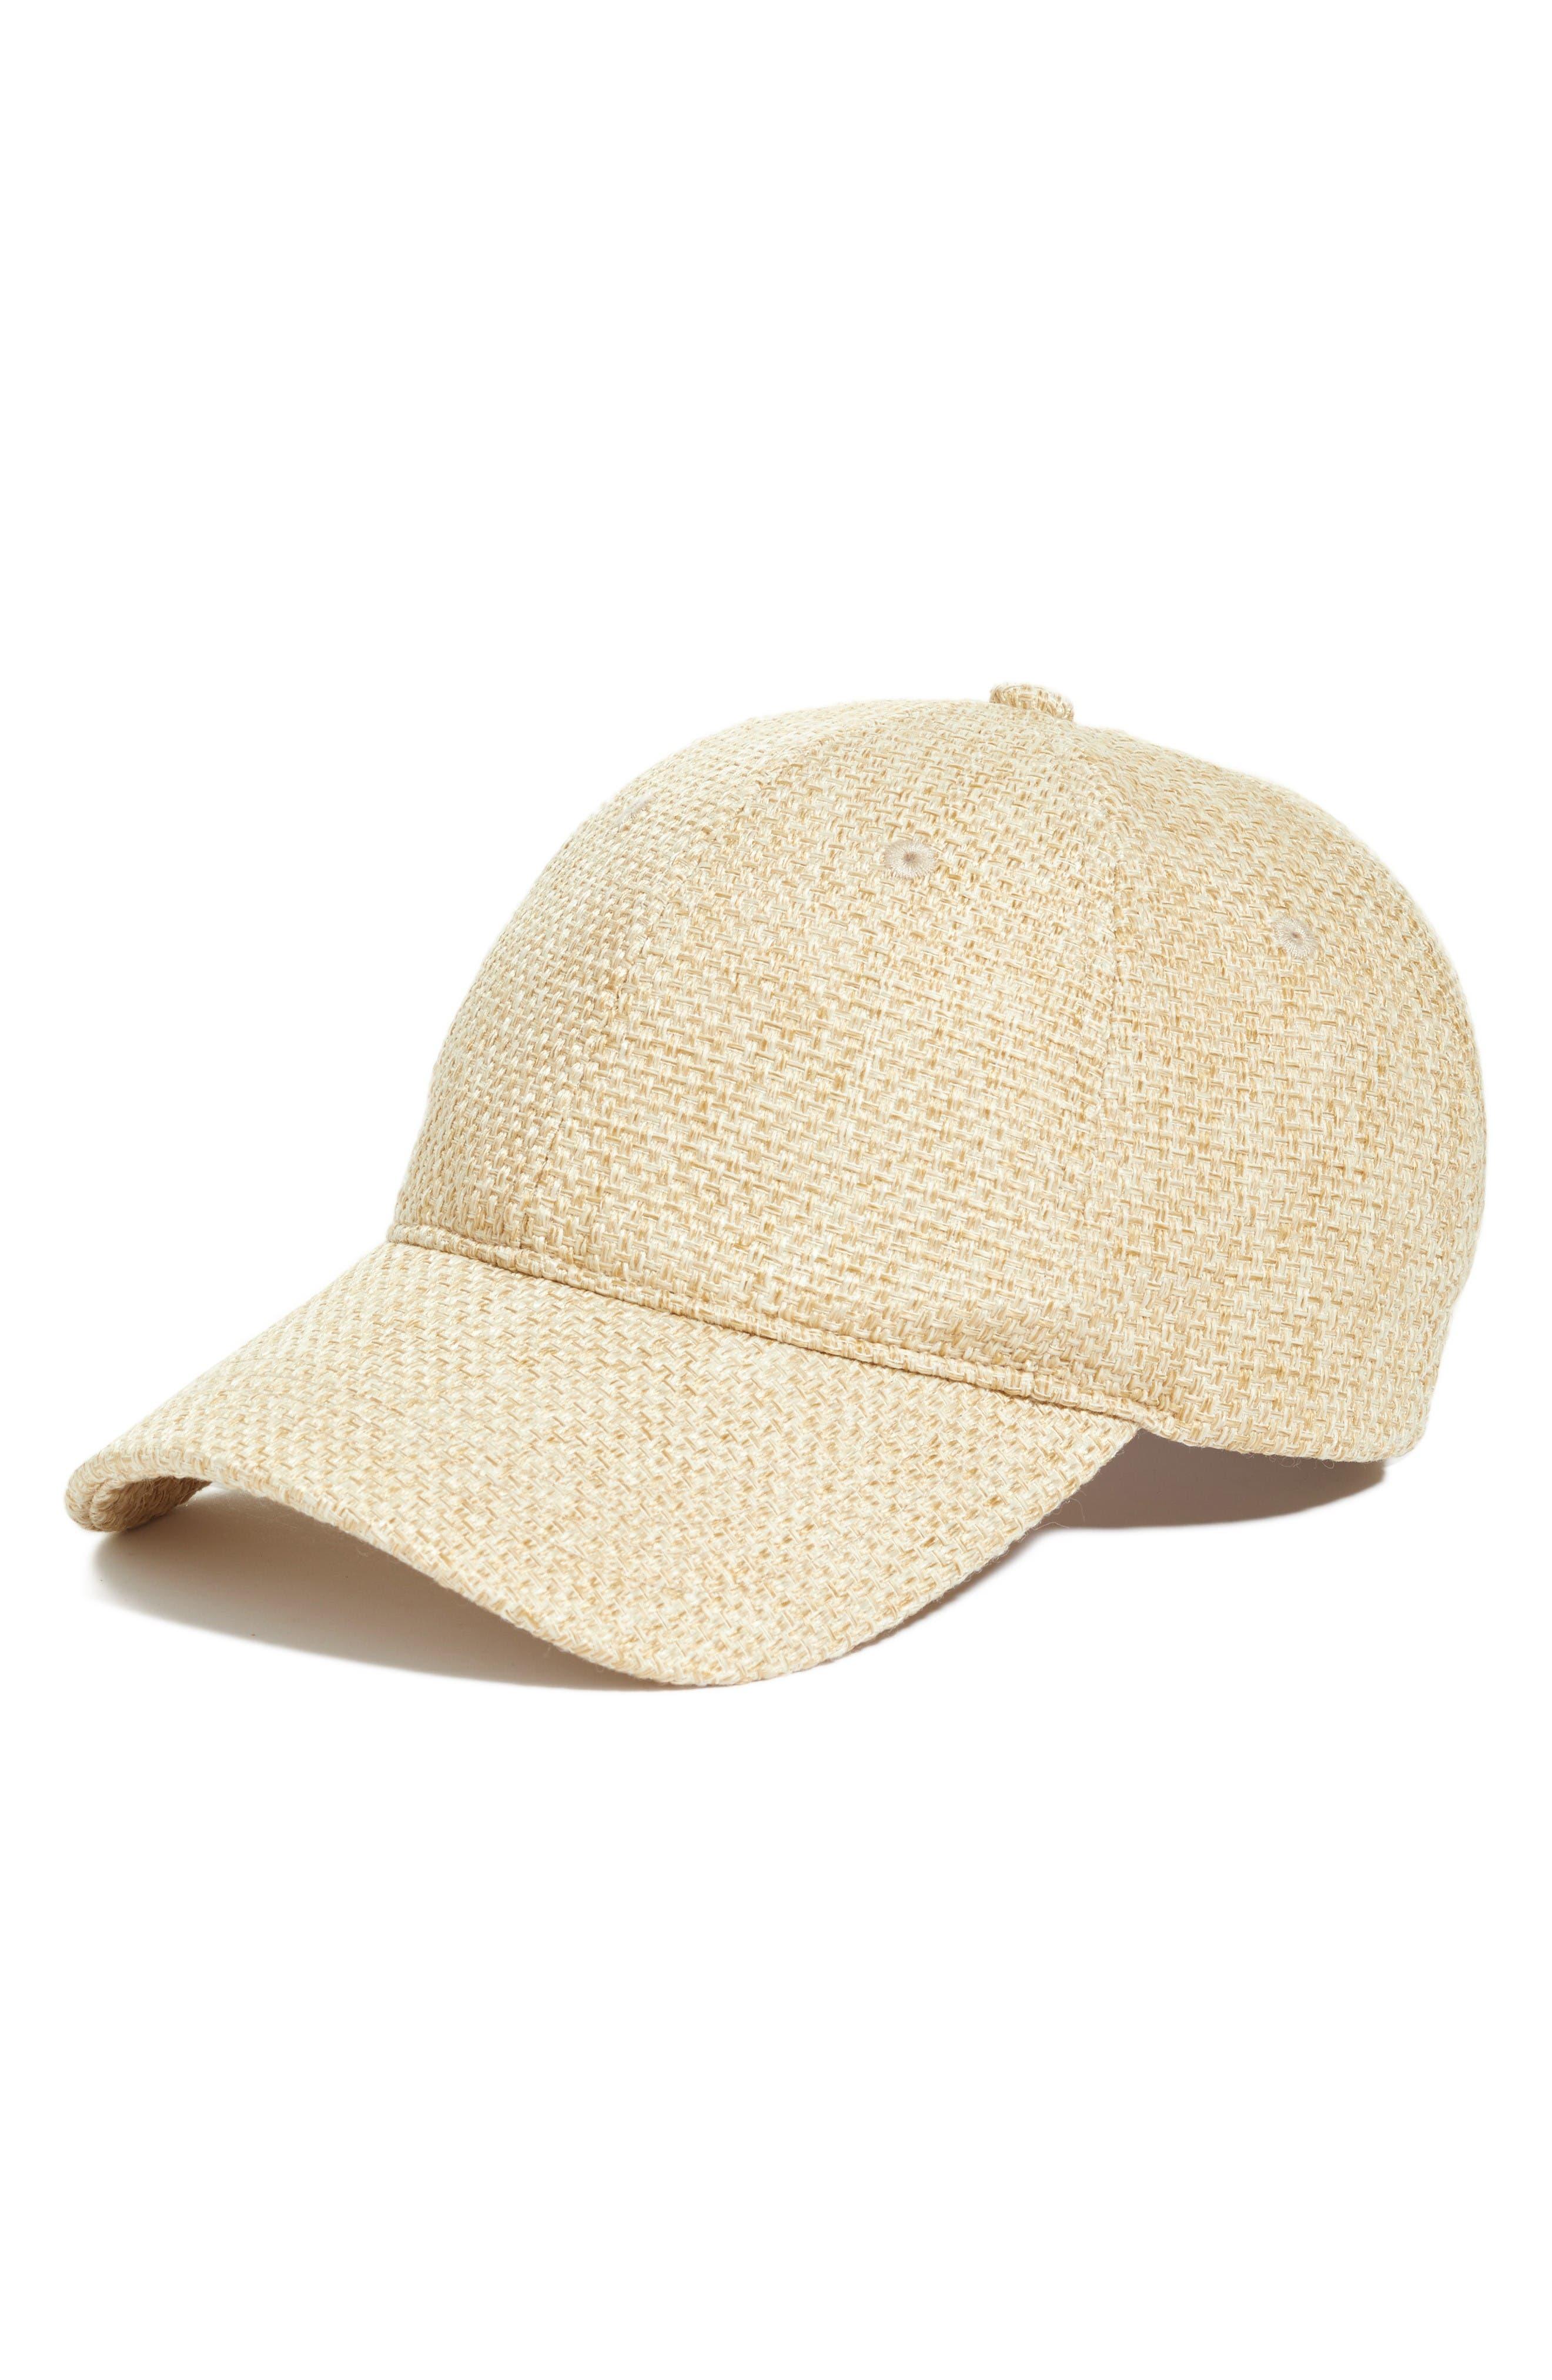 Main Image - Treasure & Bond Straw Baseball Cap